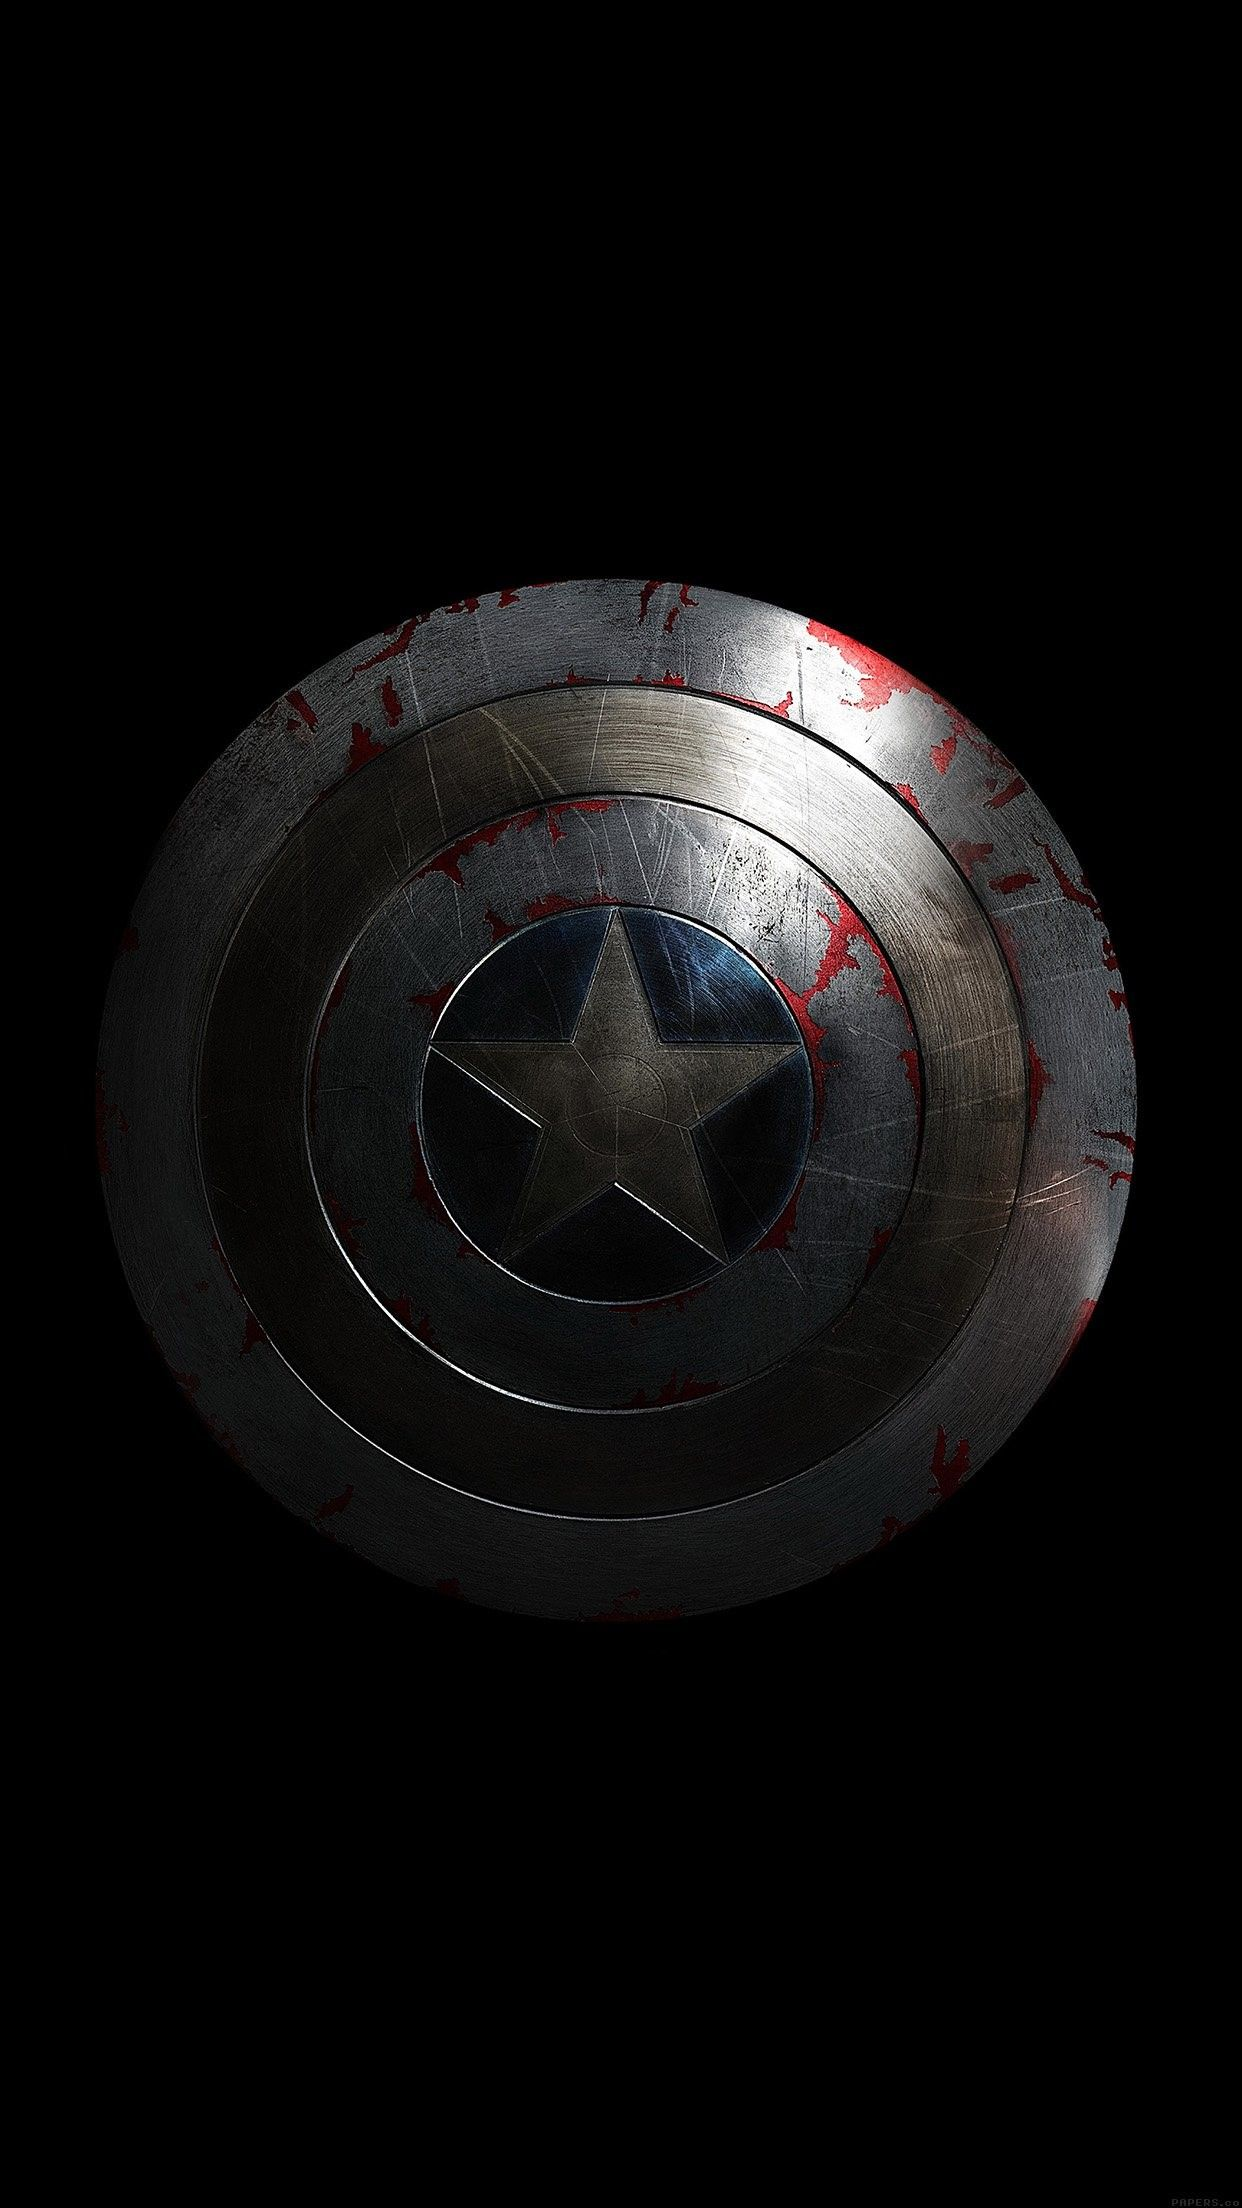 Avengers Iphone Wallpaper 81 Images Avengers Wallpaper Captain America Wallpaper Captain America Shield Wallpaper